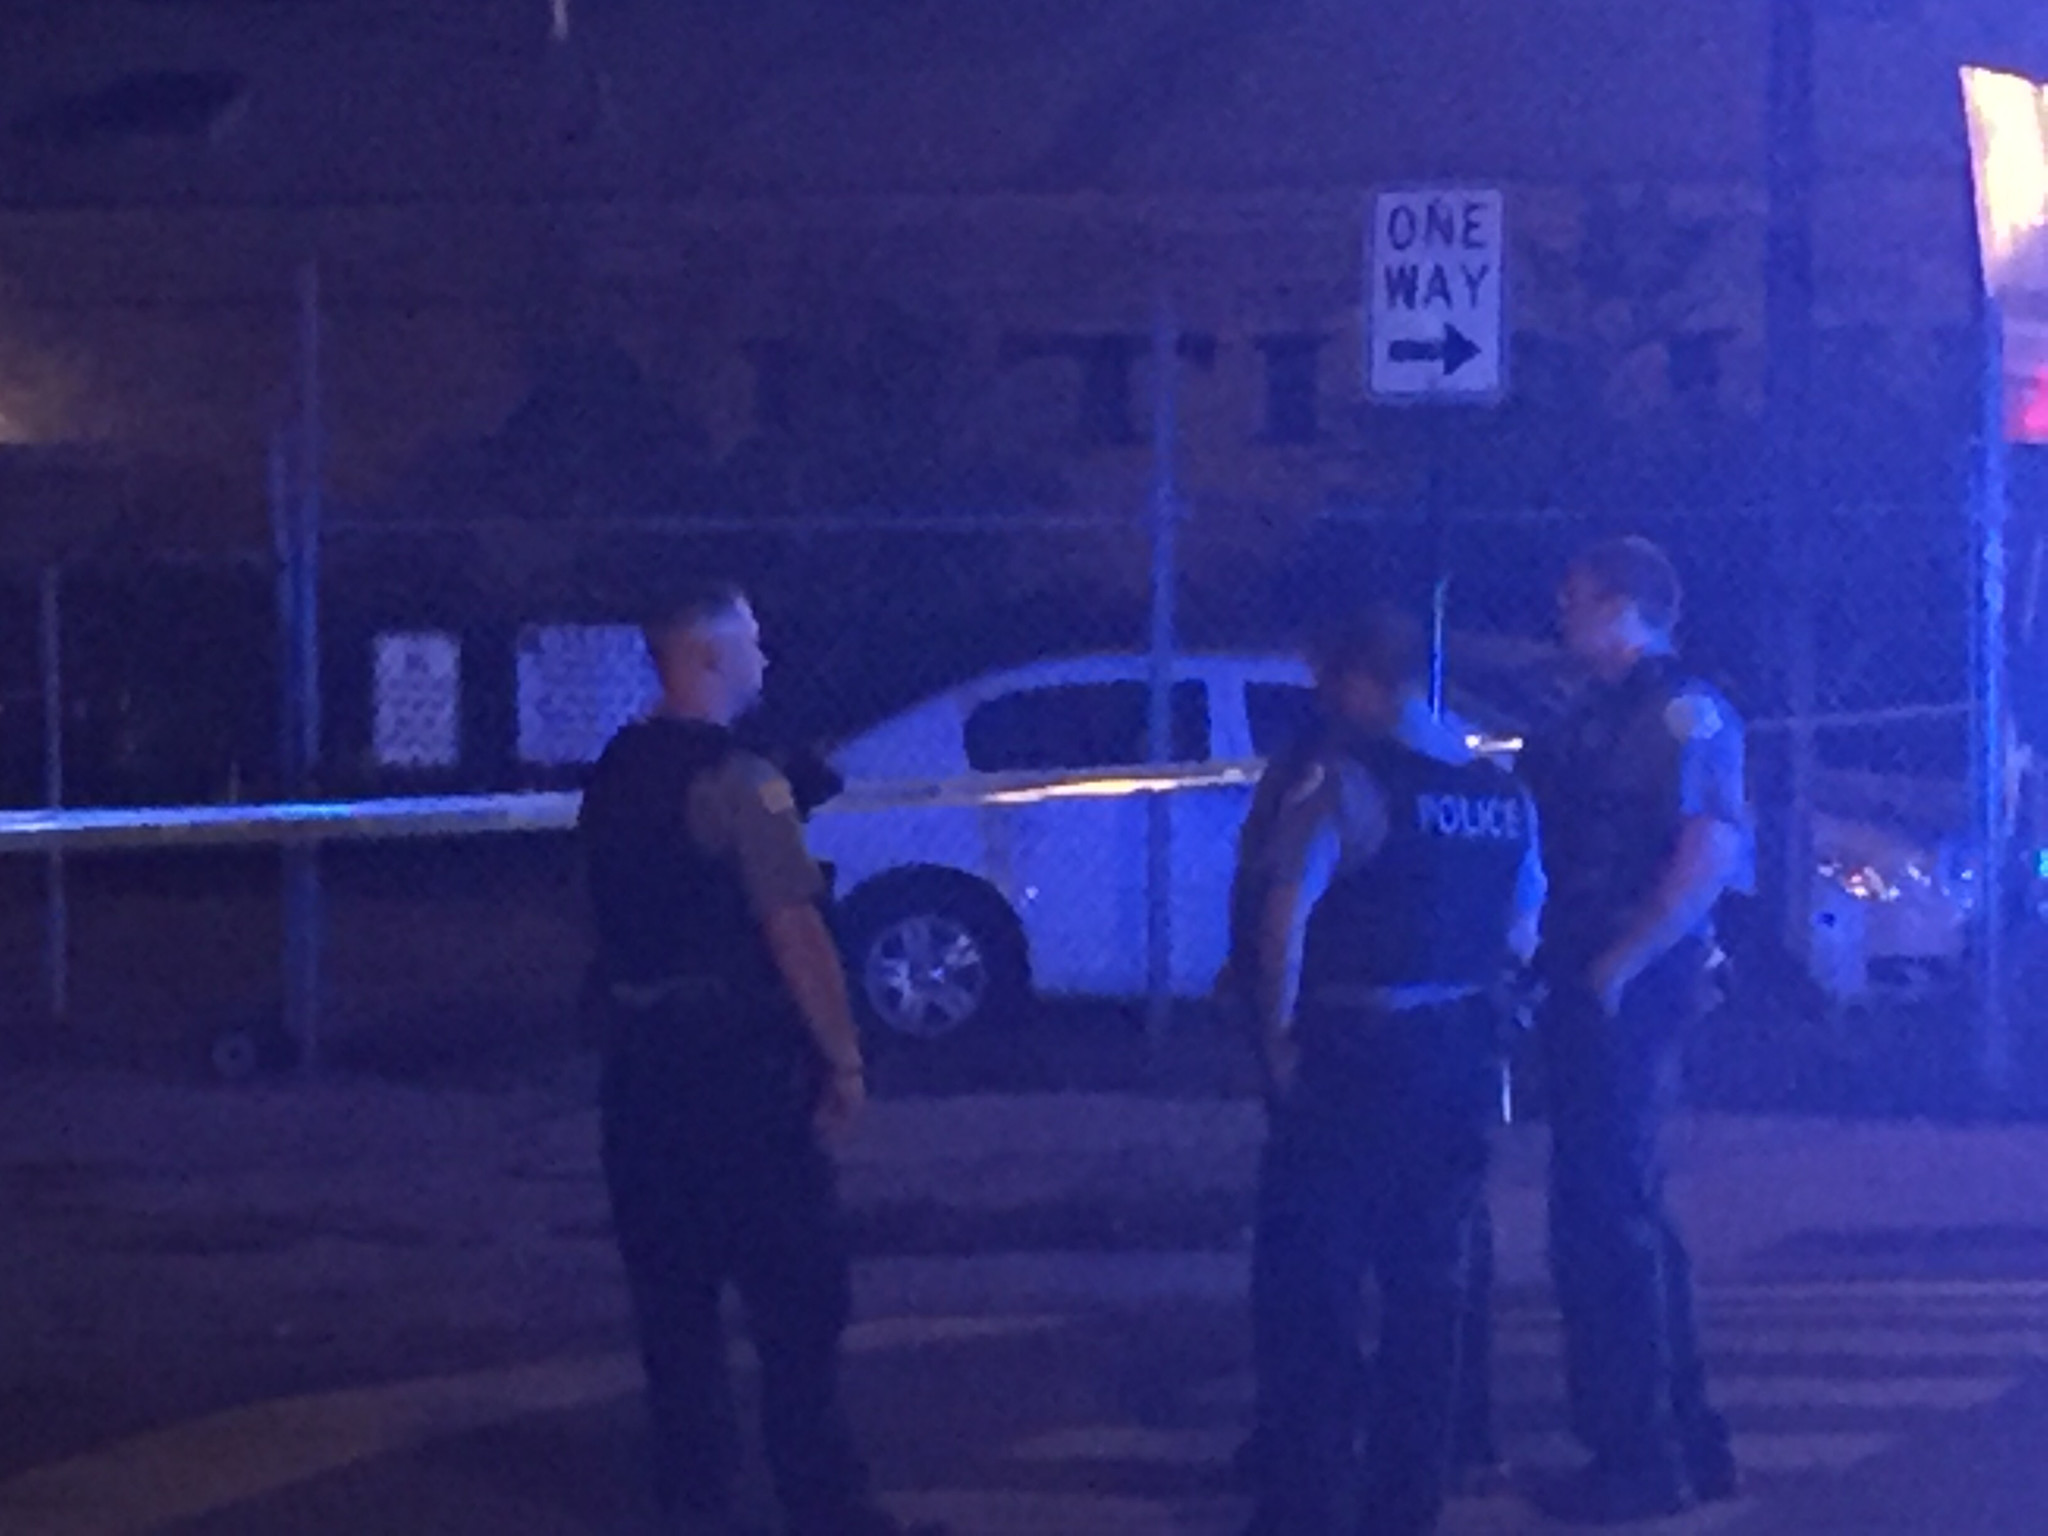 Police squad caught in gunfire prompts SWAT response in Avondale | Chicago Tribune